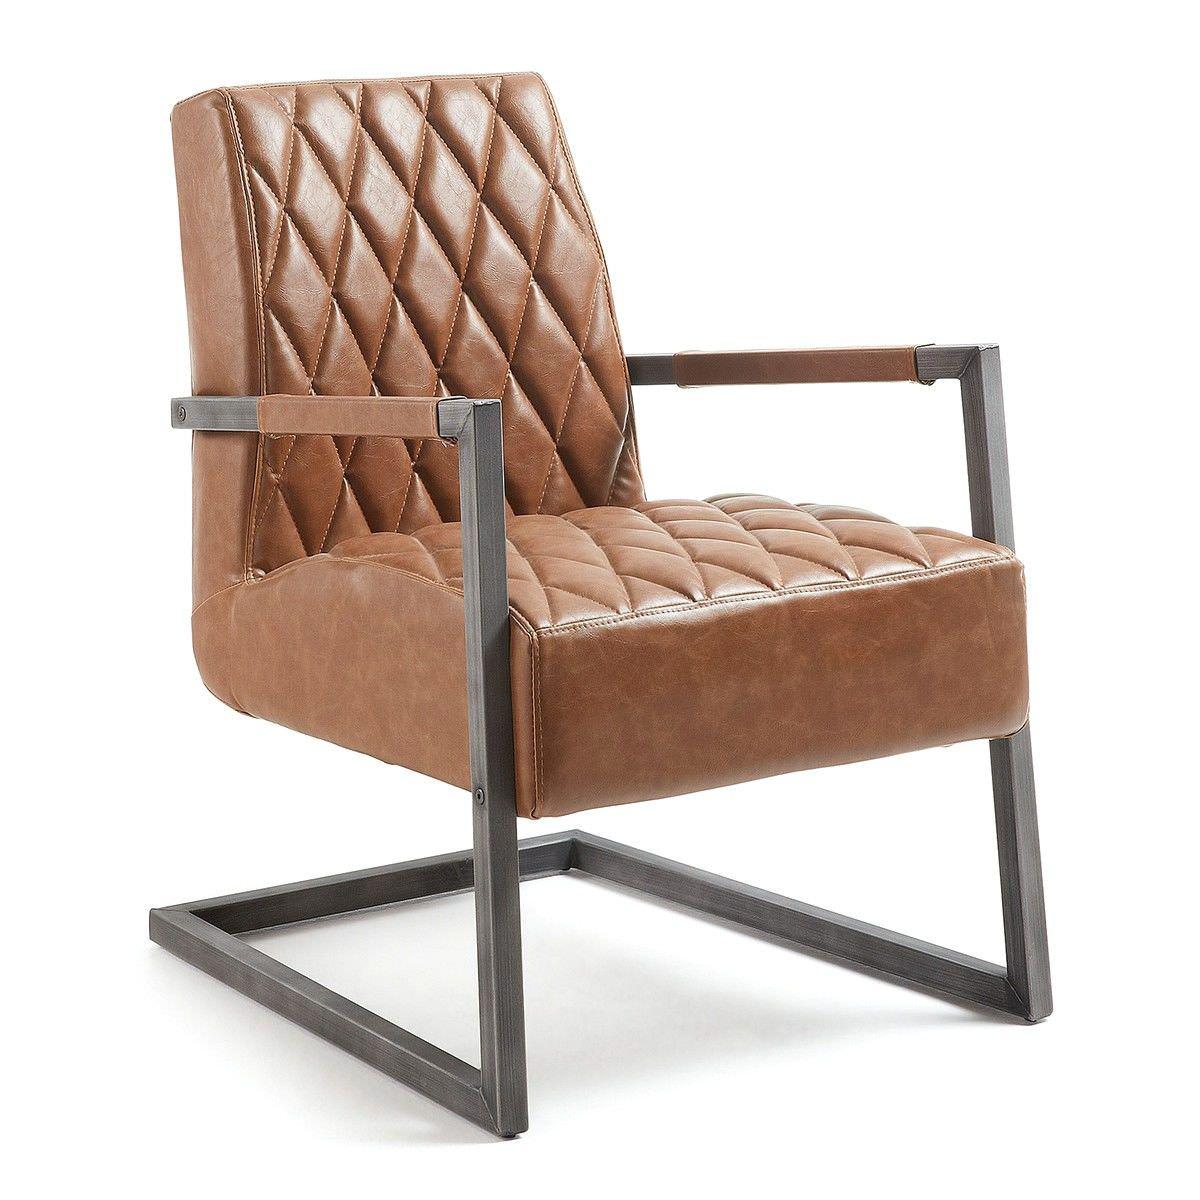 Dillon PU Leather Lounge Armchair, Tan